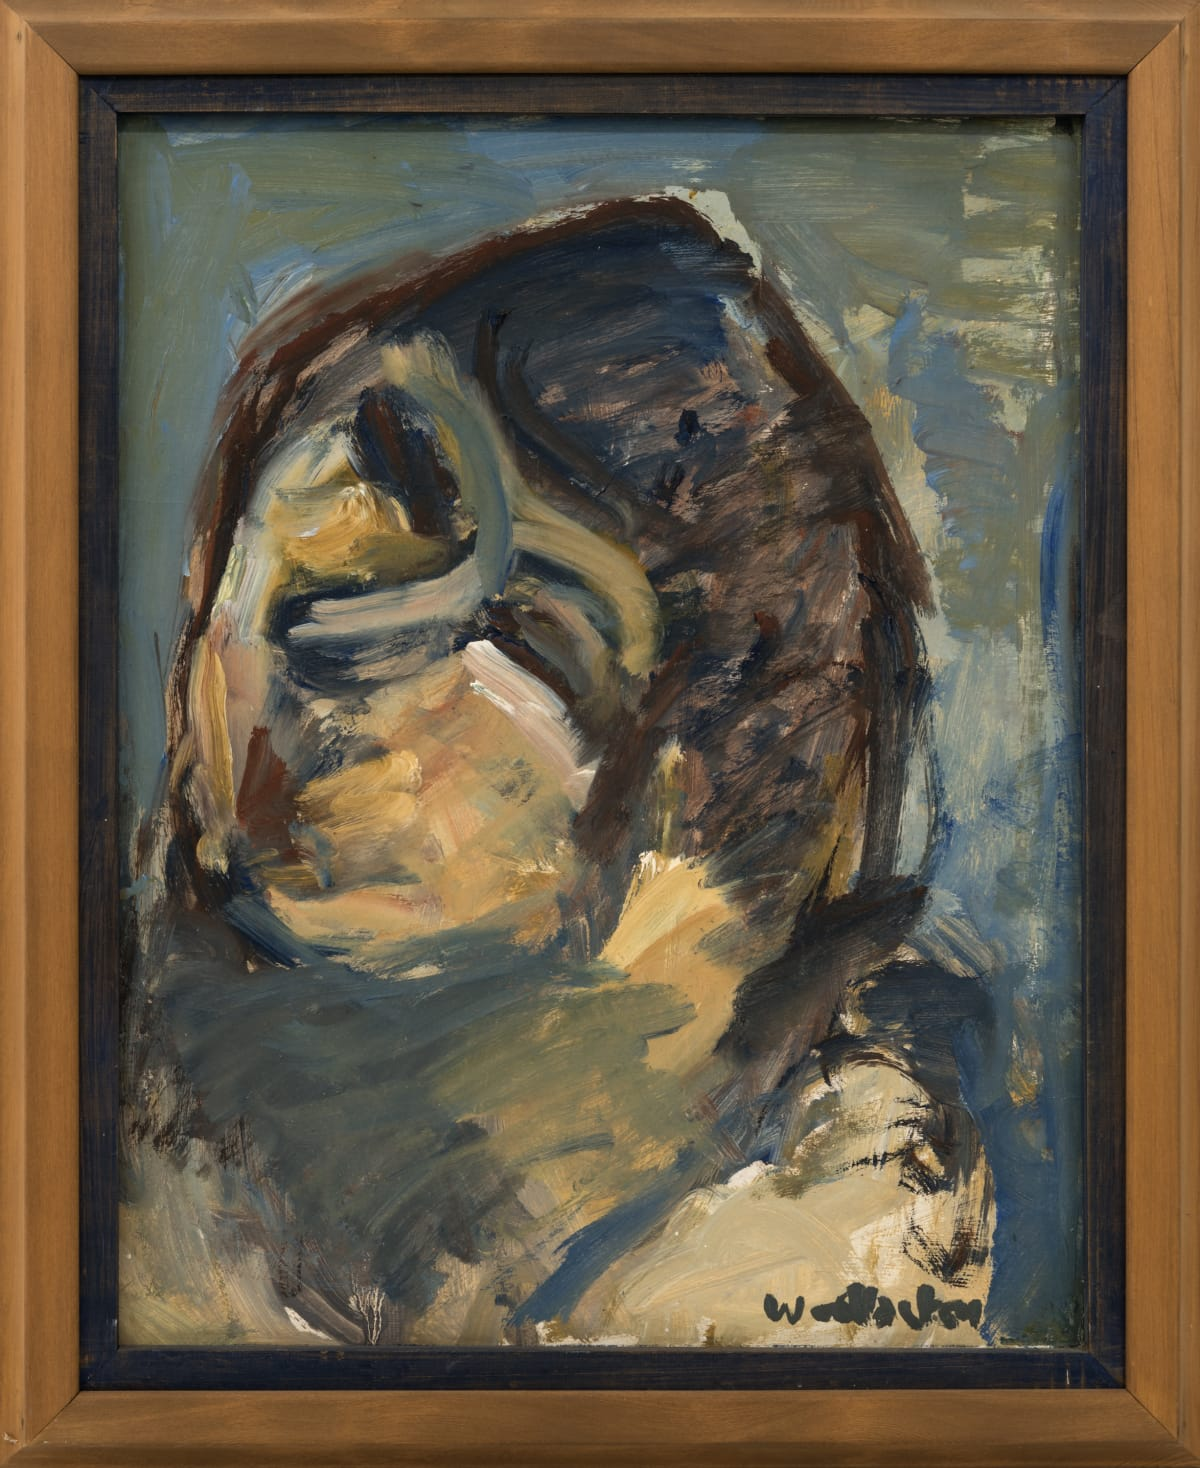 Mountford Tosswill Woollaston Sara, 1969 Oil on board 22.4 x 17.5 x 27 in 57 x 44.5 x 68.5 cm